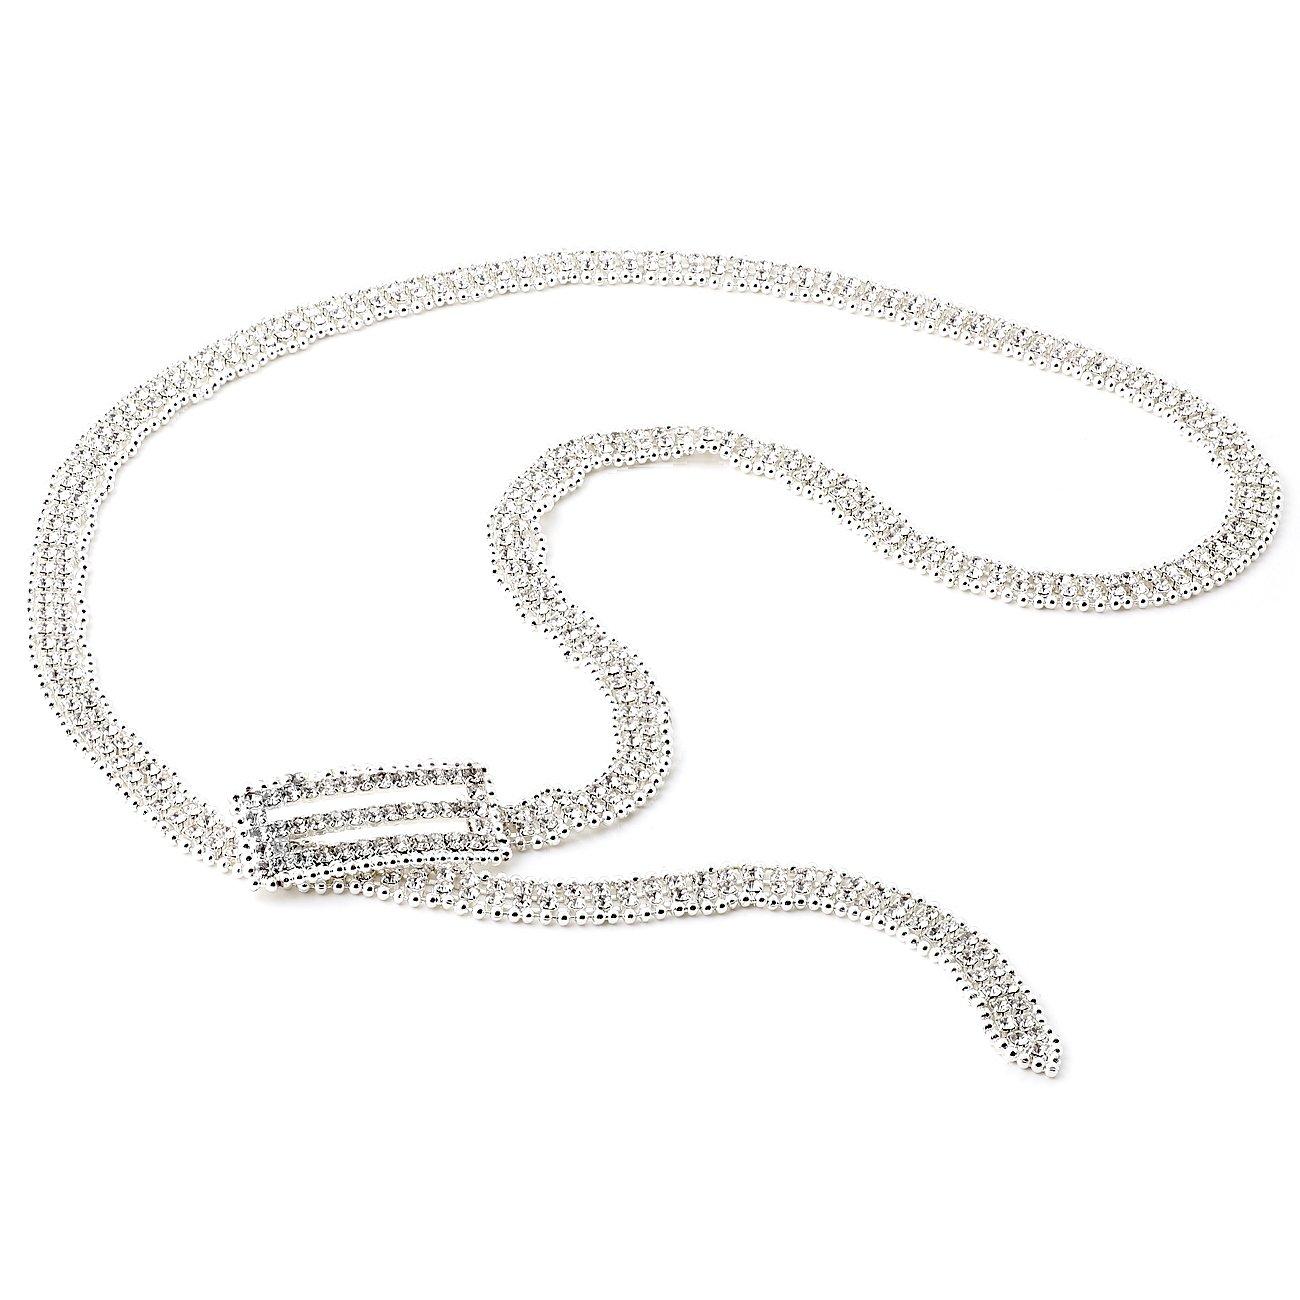 Topwholesale Silver Crystal Rhinestone Silver Beads Belt